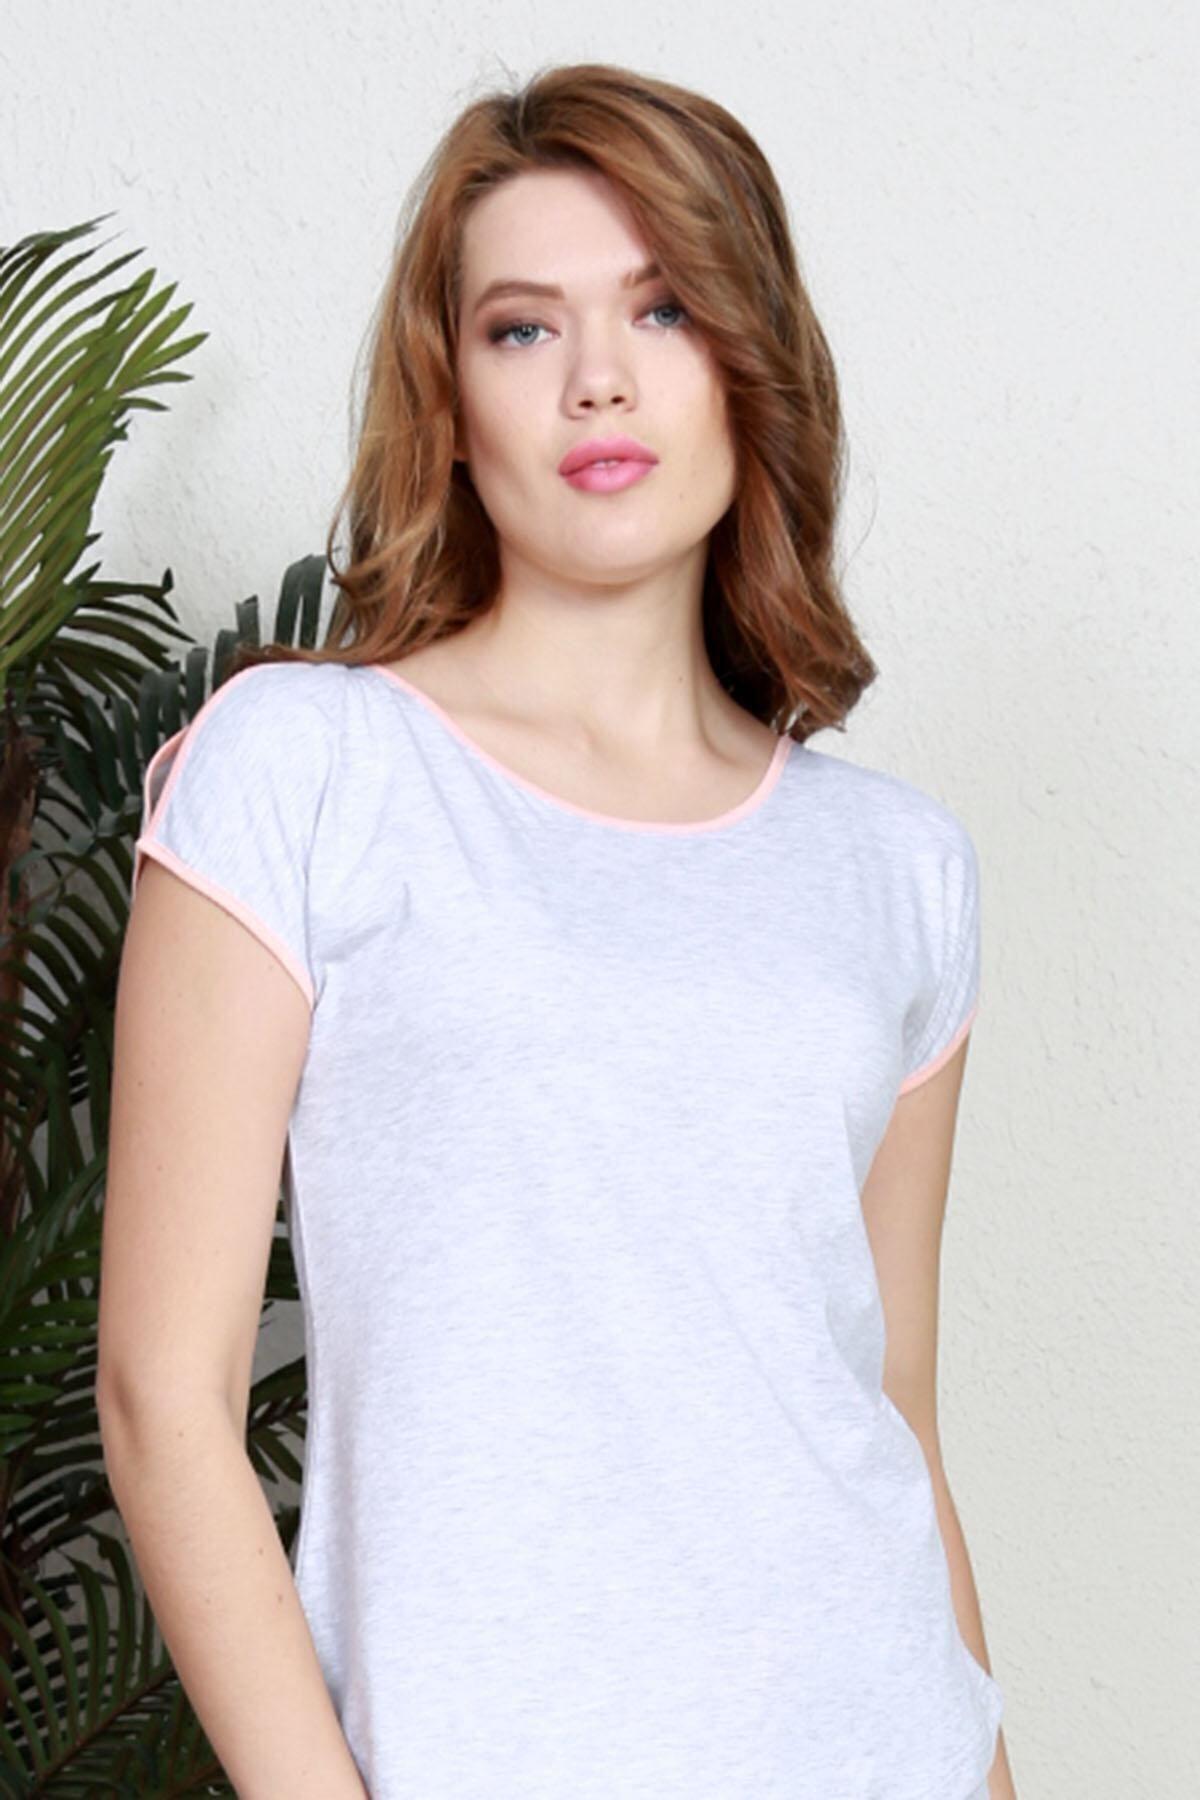 Pattaya Kadın Kısa Kollu Tişört Şort Pijama Takımı Y20s137-9111160000 2